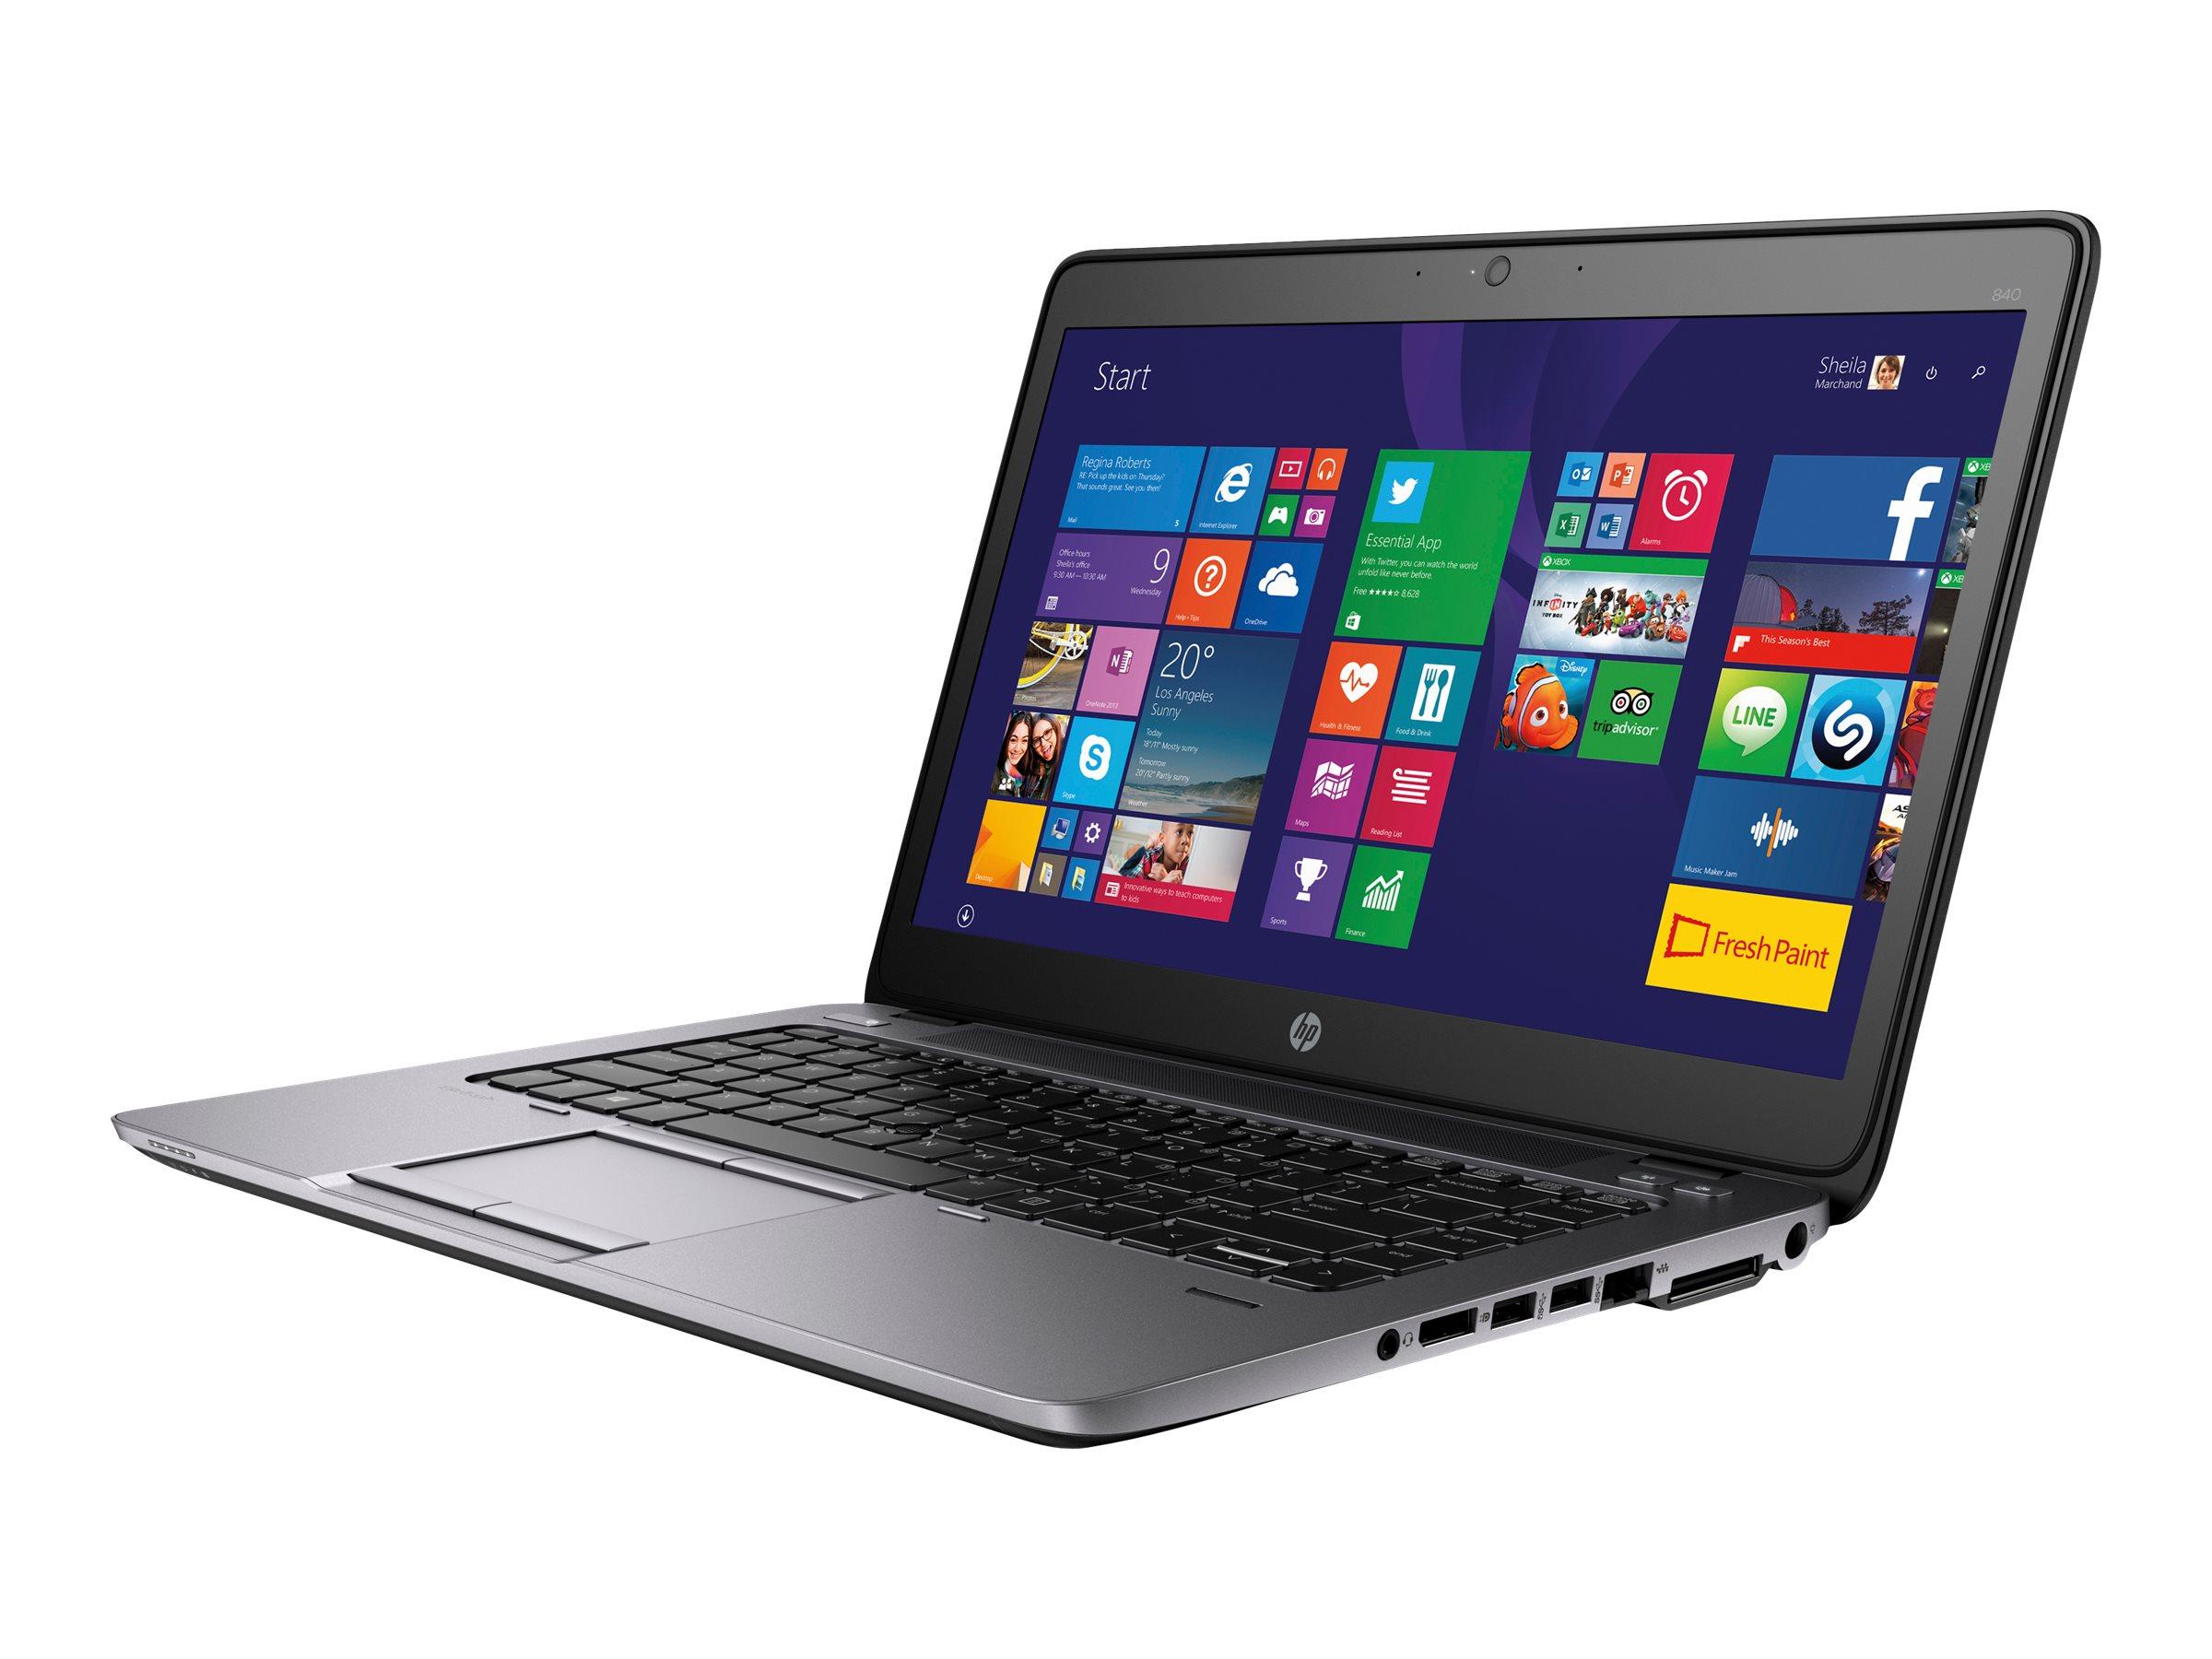 HP EliteBook 840 G1 - PC portable reconditionné 14